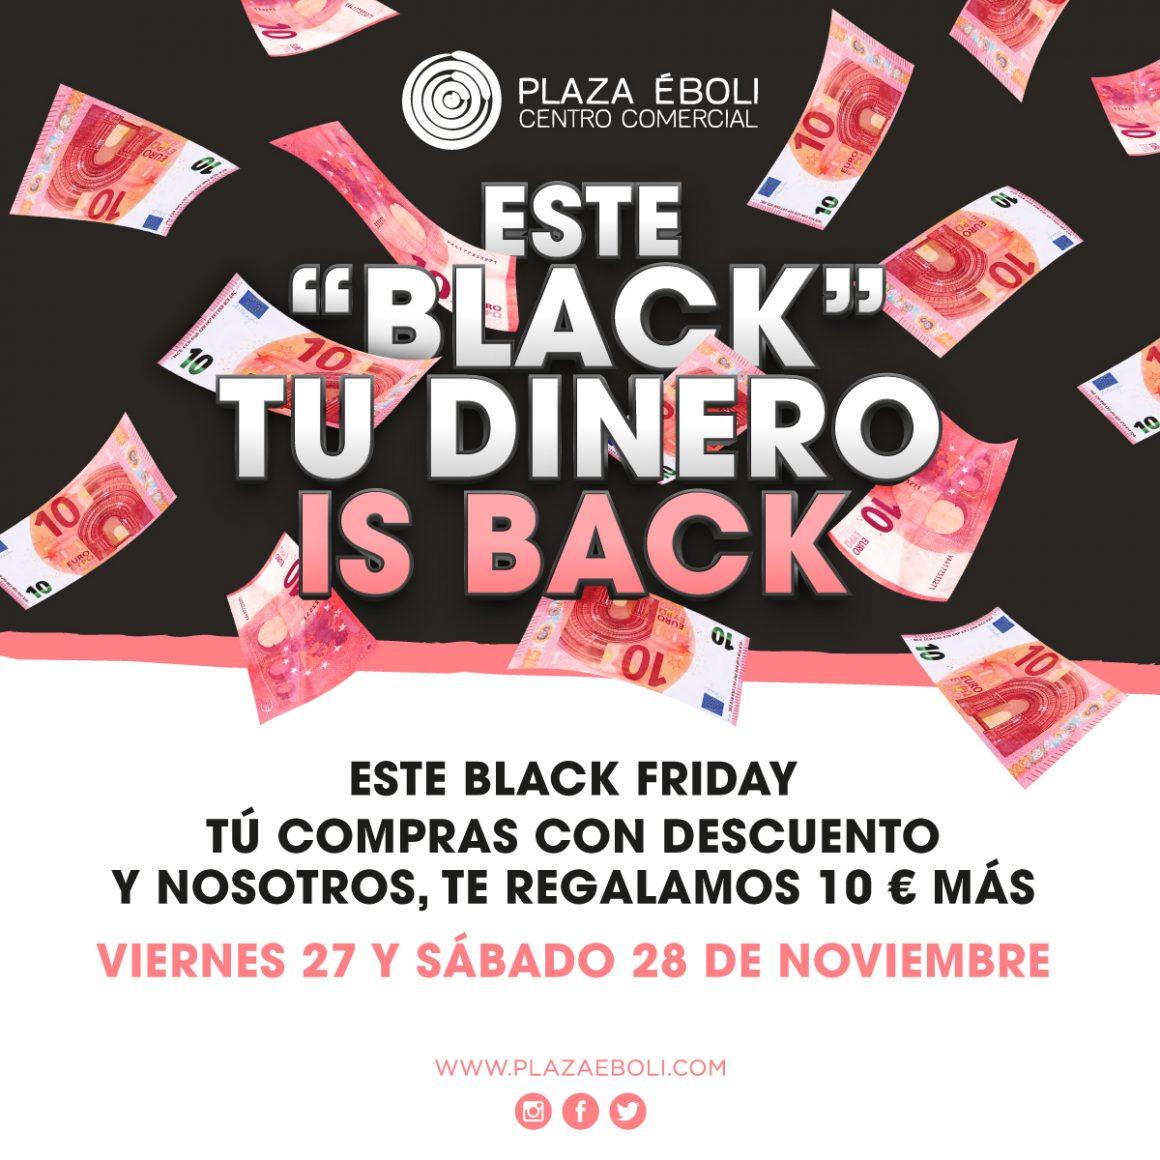 Este Black Friday tu dinero is back